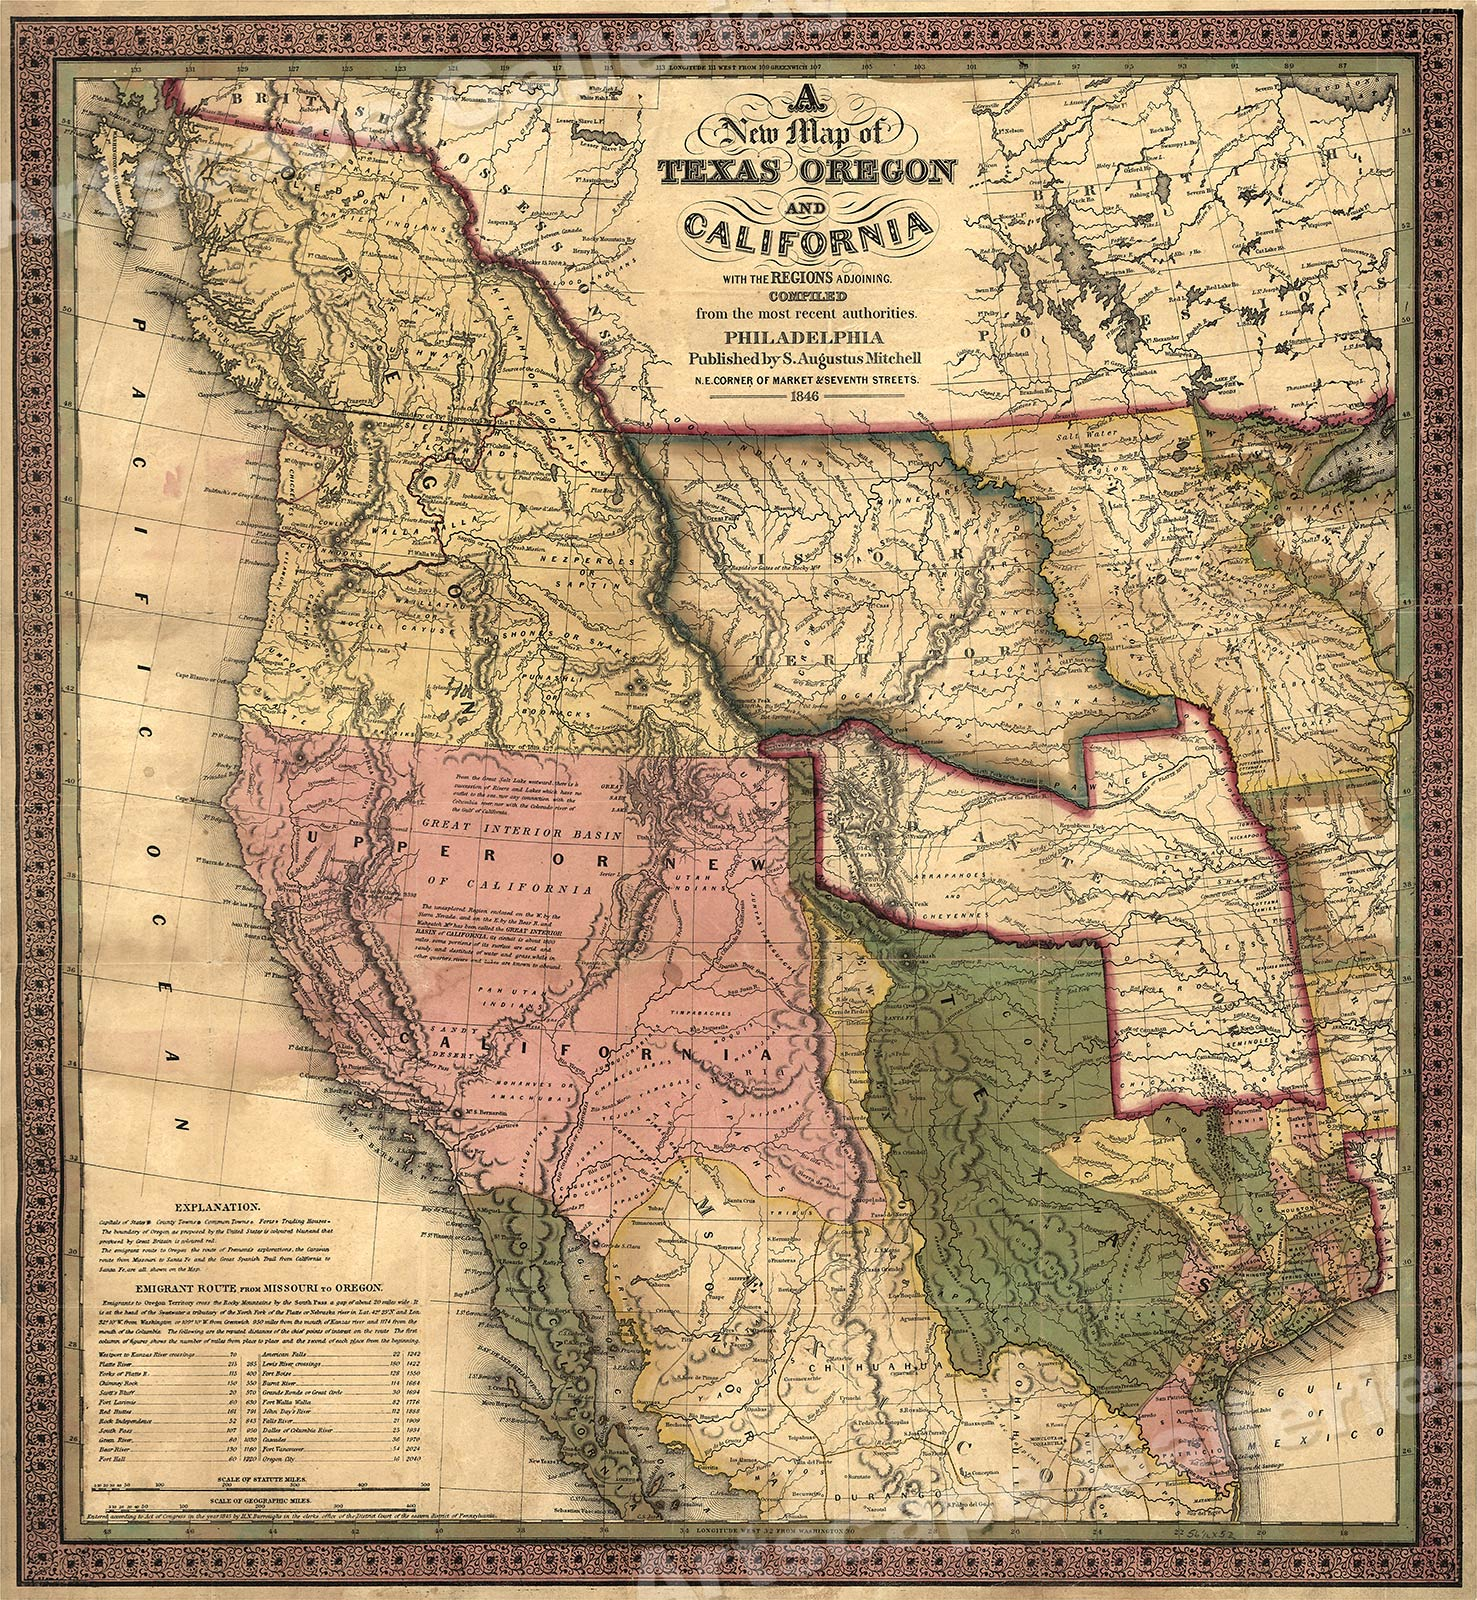 Historic 1840s Map Of Texas Oregon California Western Us 24x26